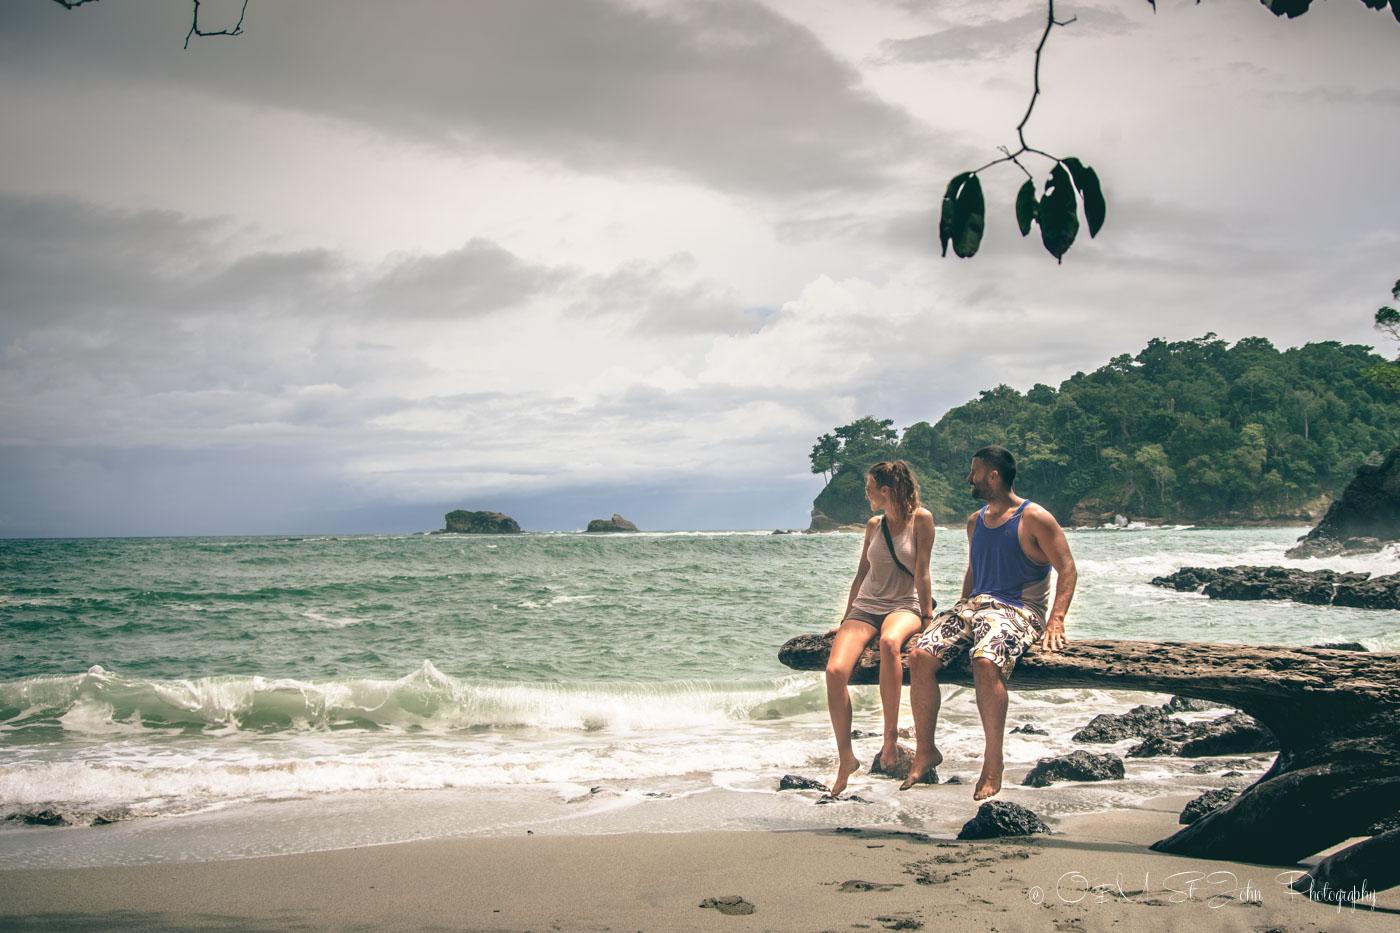 Oksana & Max on Gemelas Beach in Manuel Antonio National Park. Costa Rica